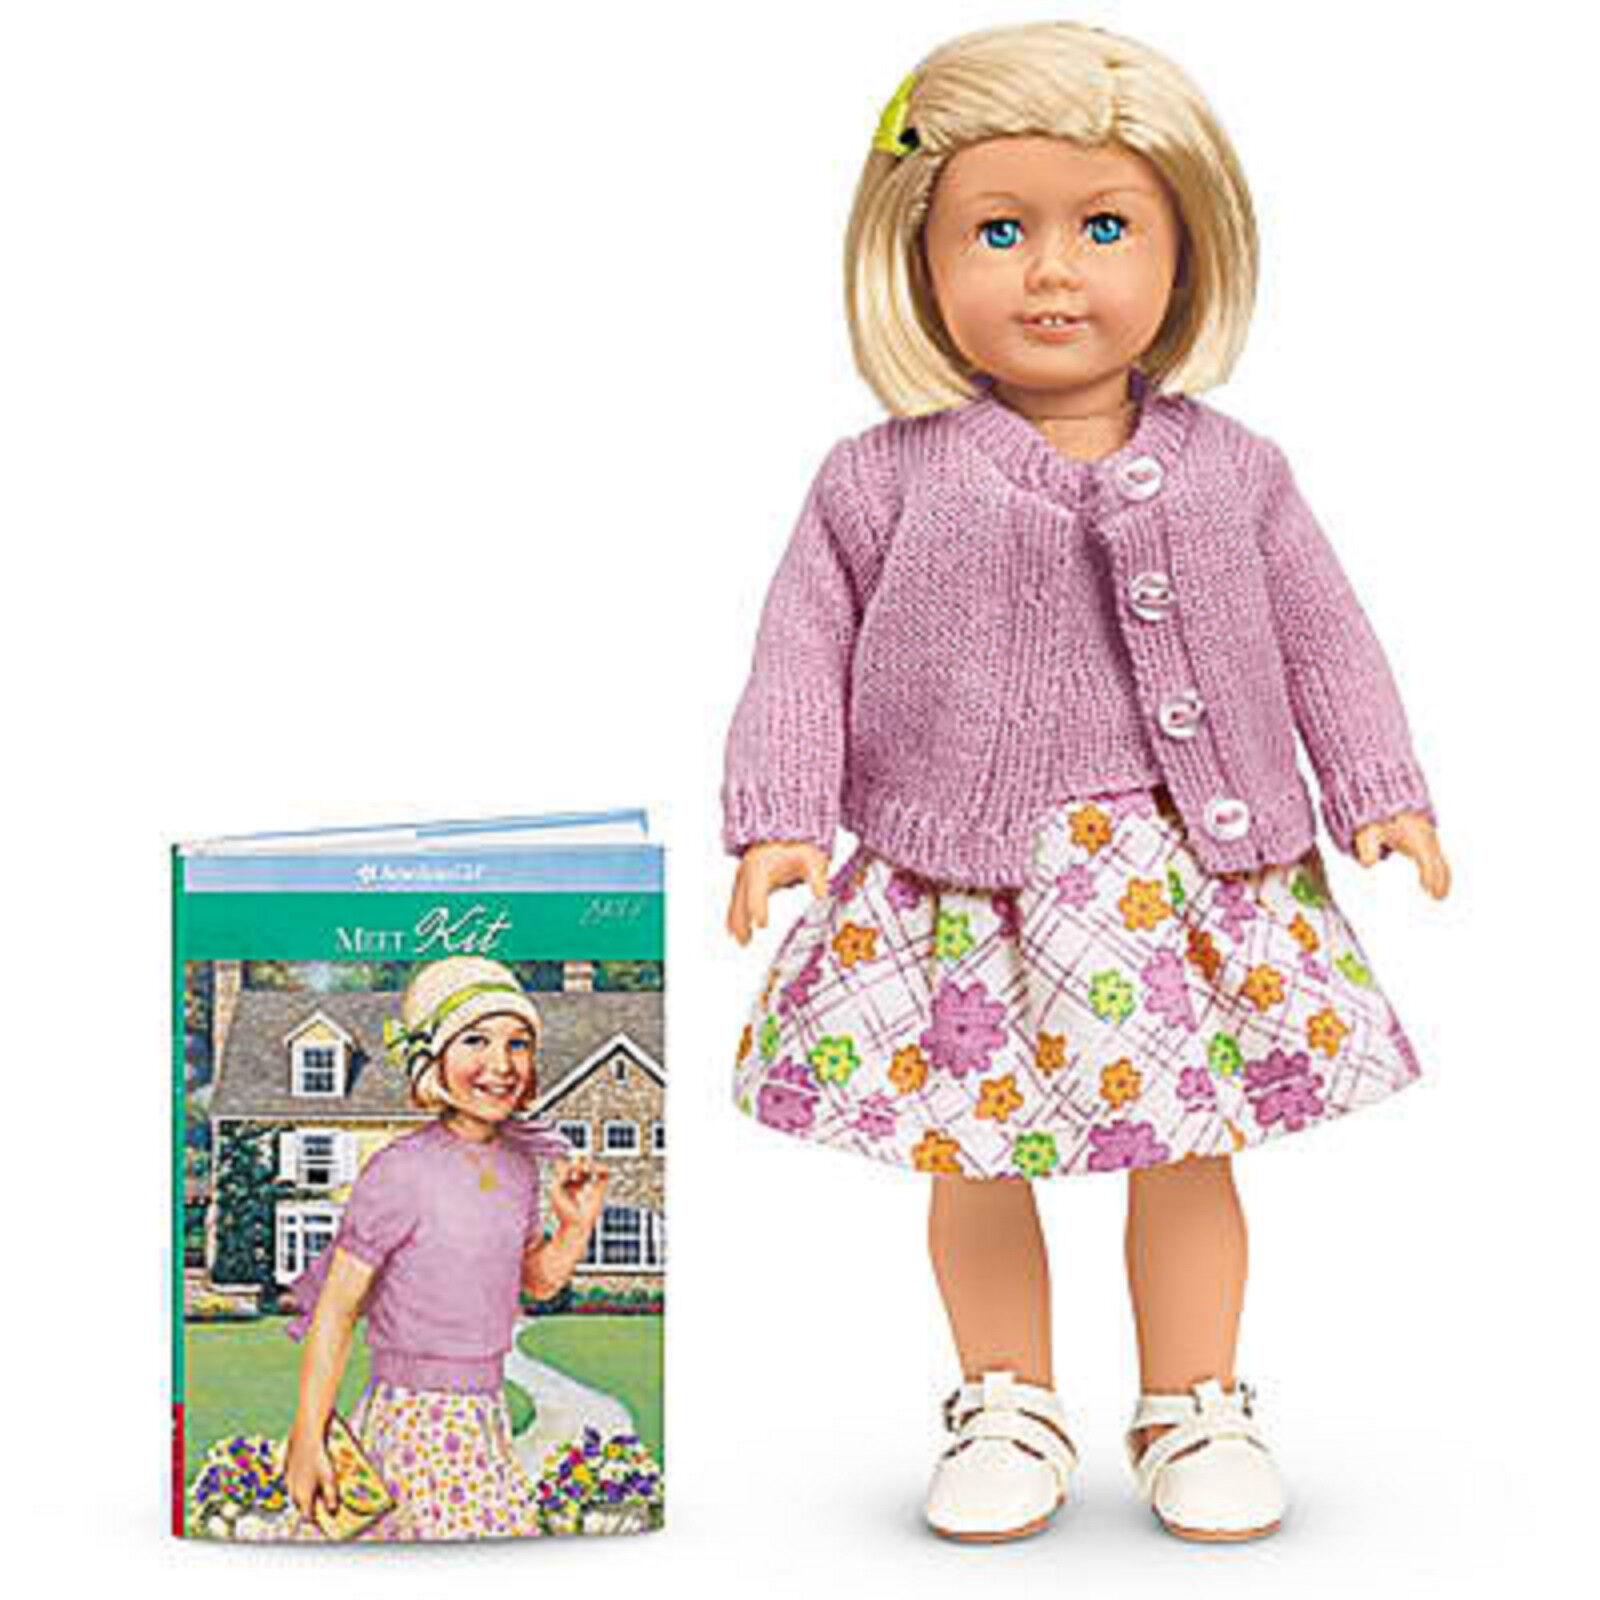 American Girl SETS Mini Puppe 15.2cm + Buch Neu in Karton Blond Set Kleid